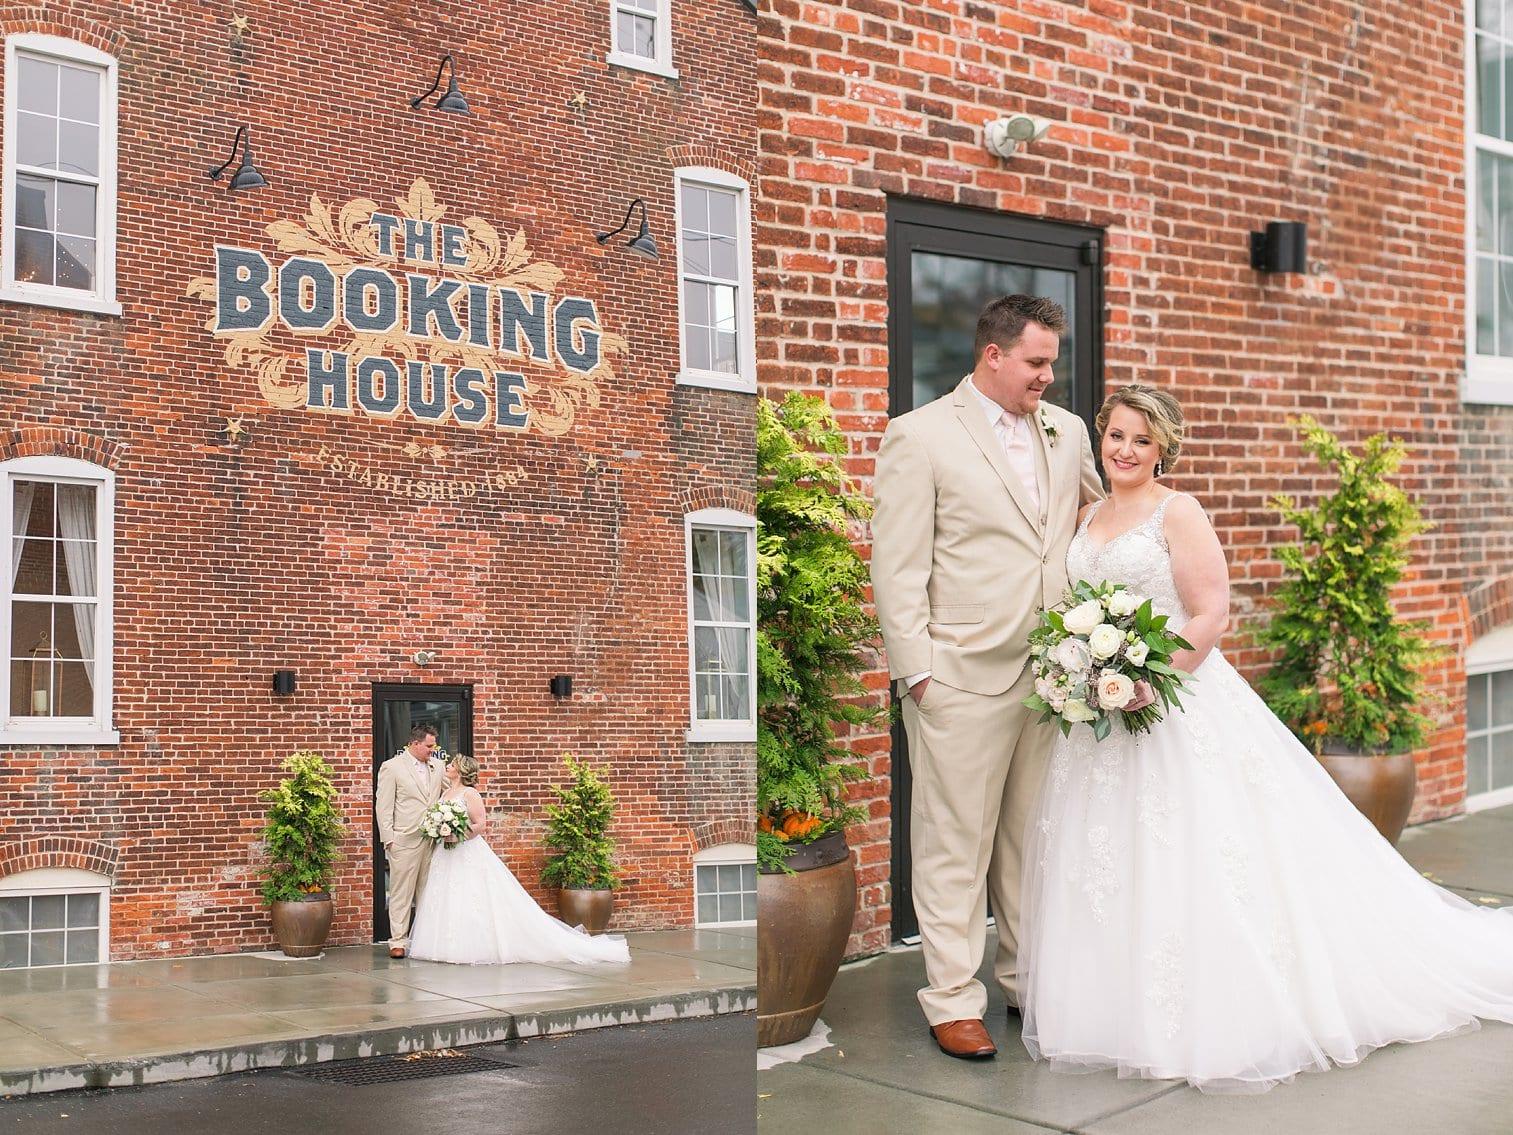 The Booking House Wedding Photos Pennsylvania Photographer Megan Kelsey Photography Kayla & Evan-217.jpg